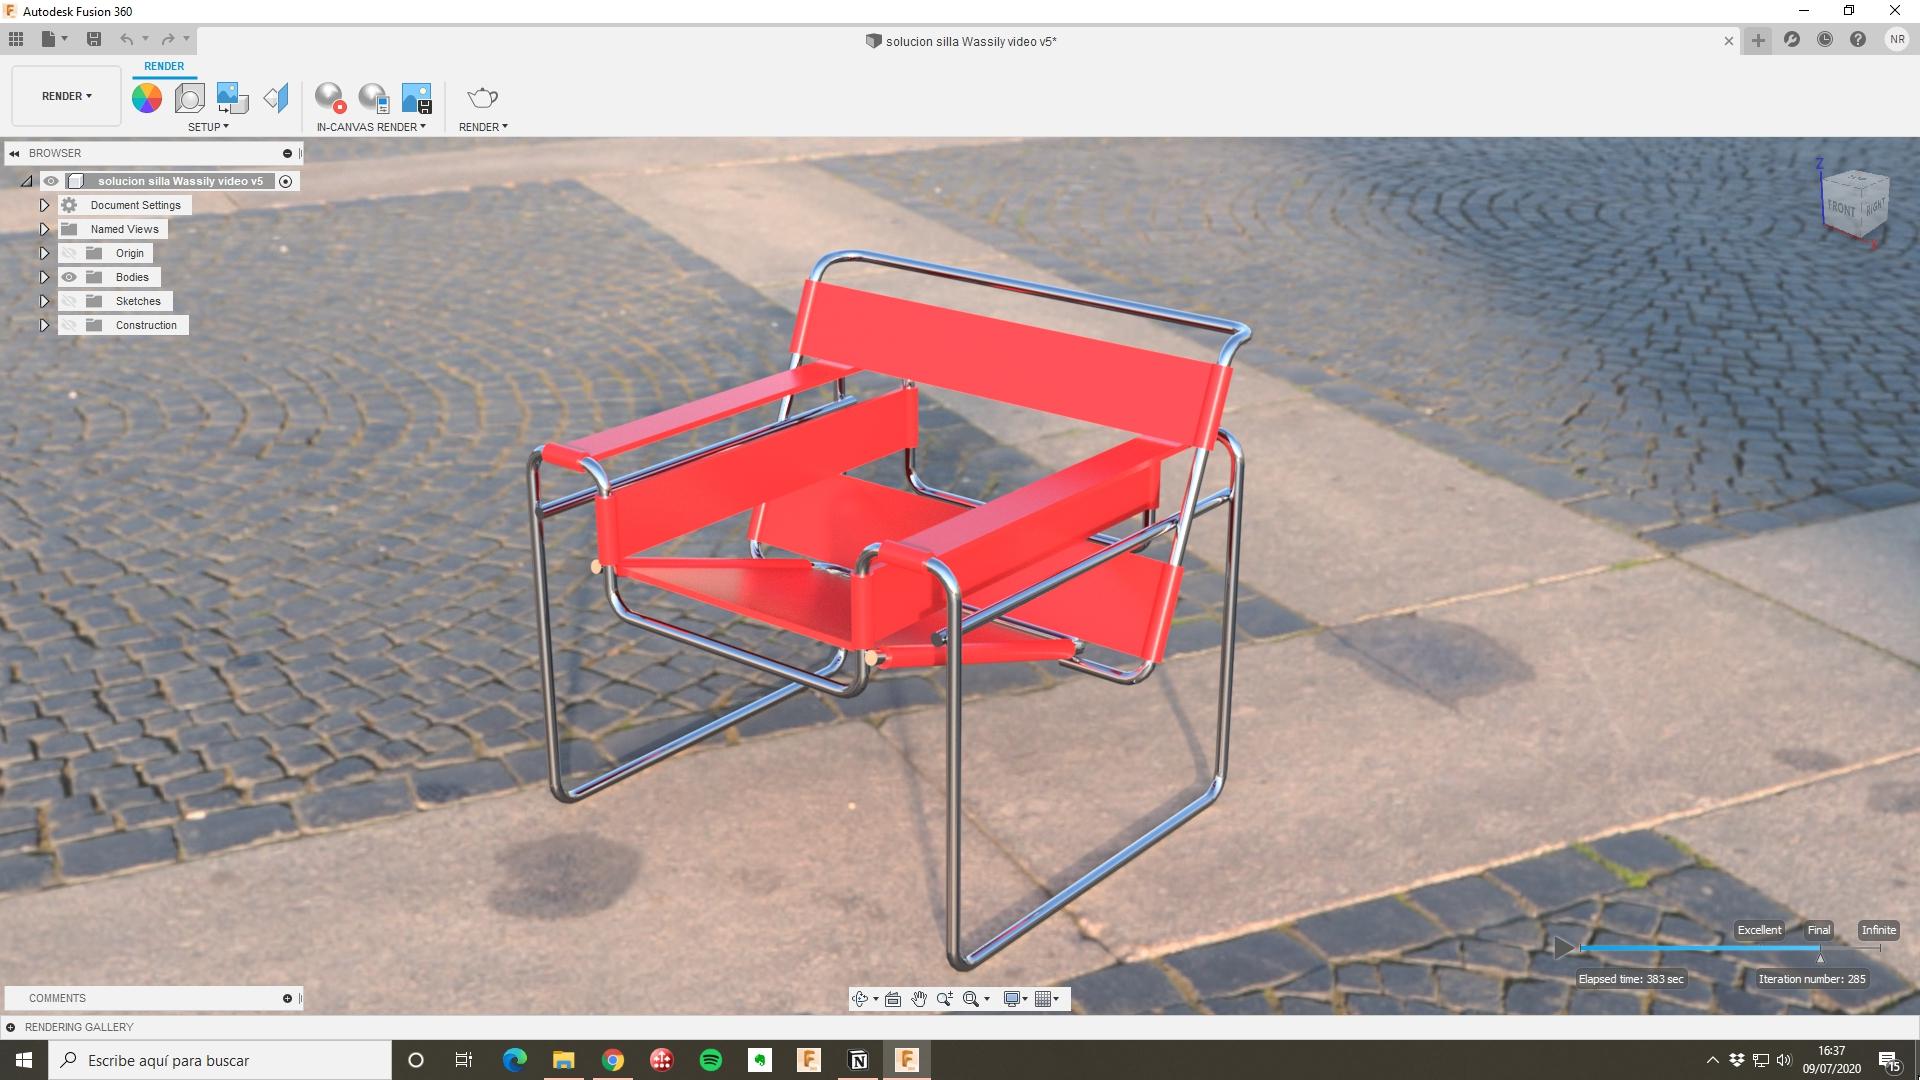 Silla Wassily screenshot Fusion 360